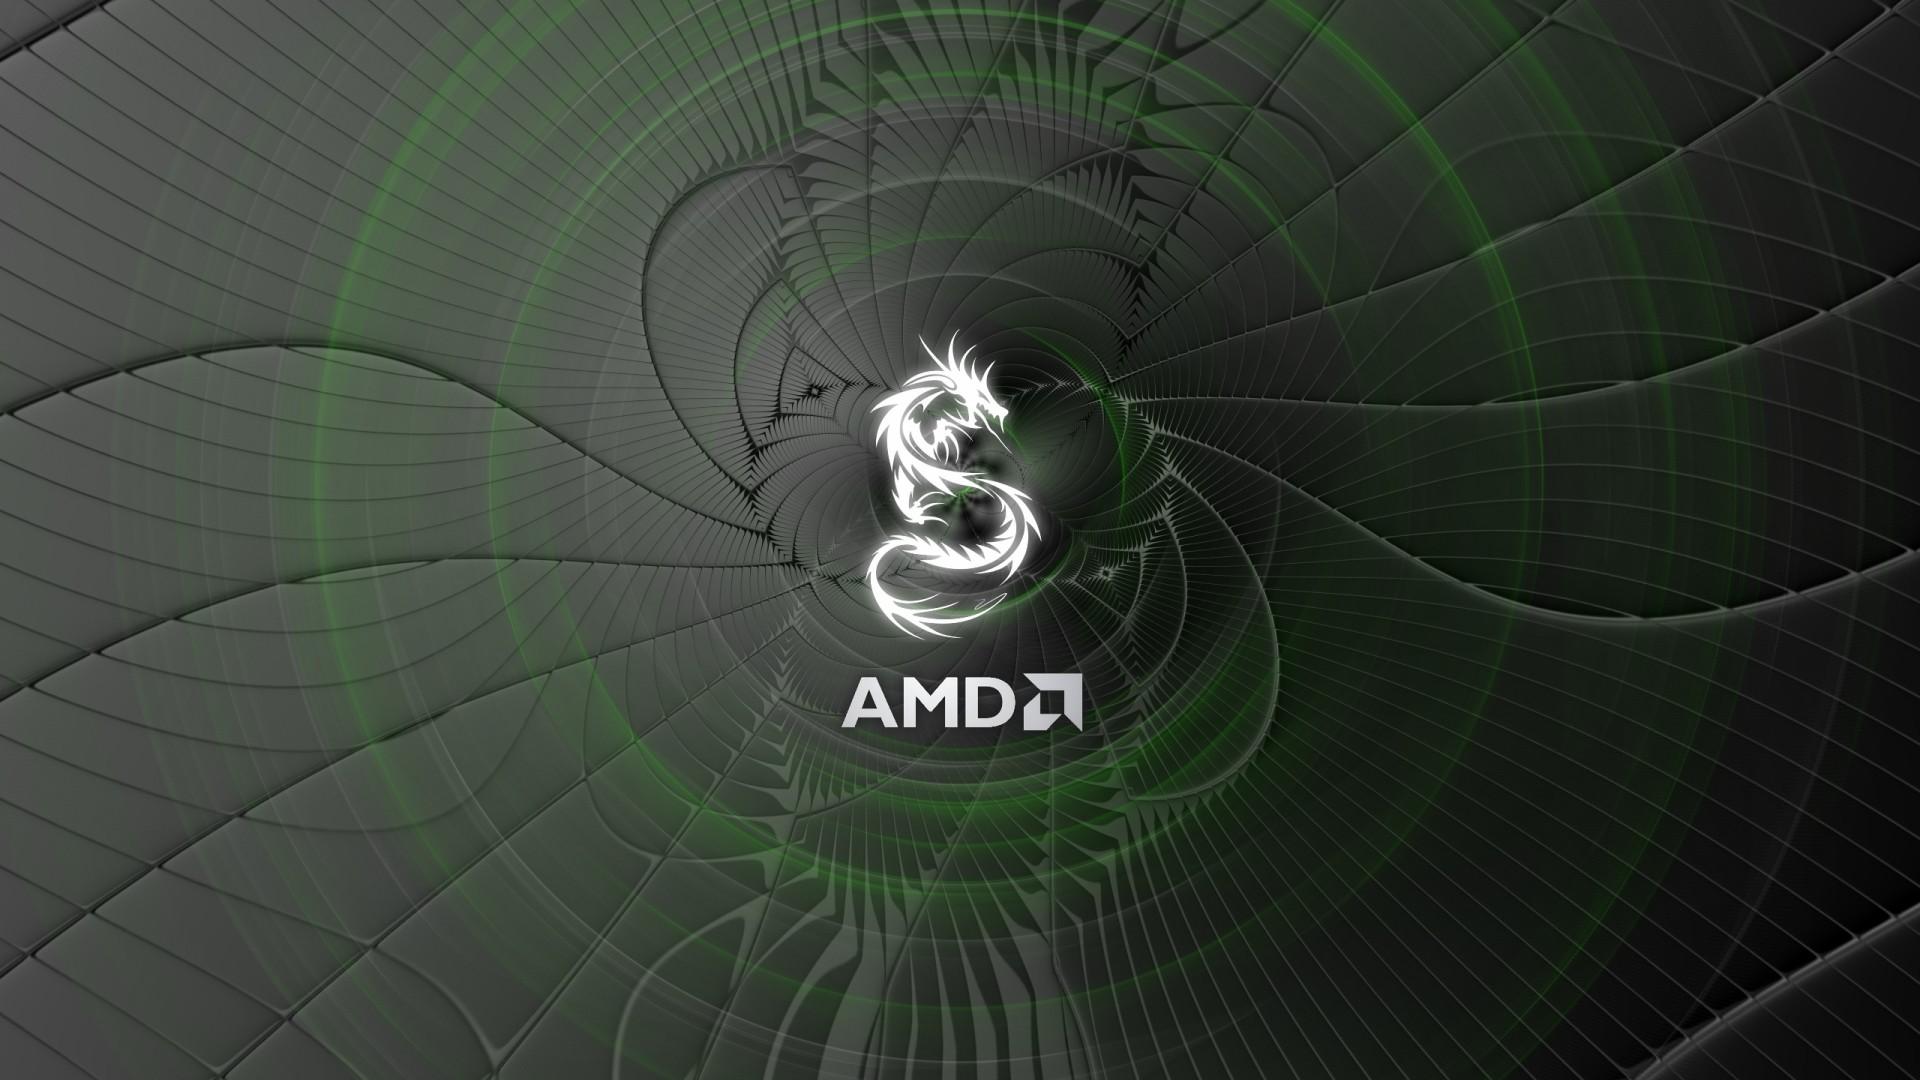 AMD FX Wallpaper – WallpaperSafari